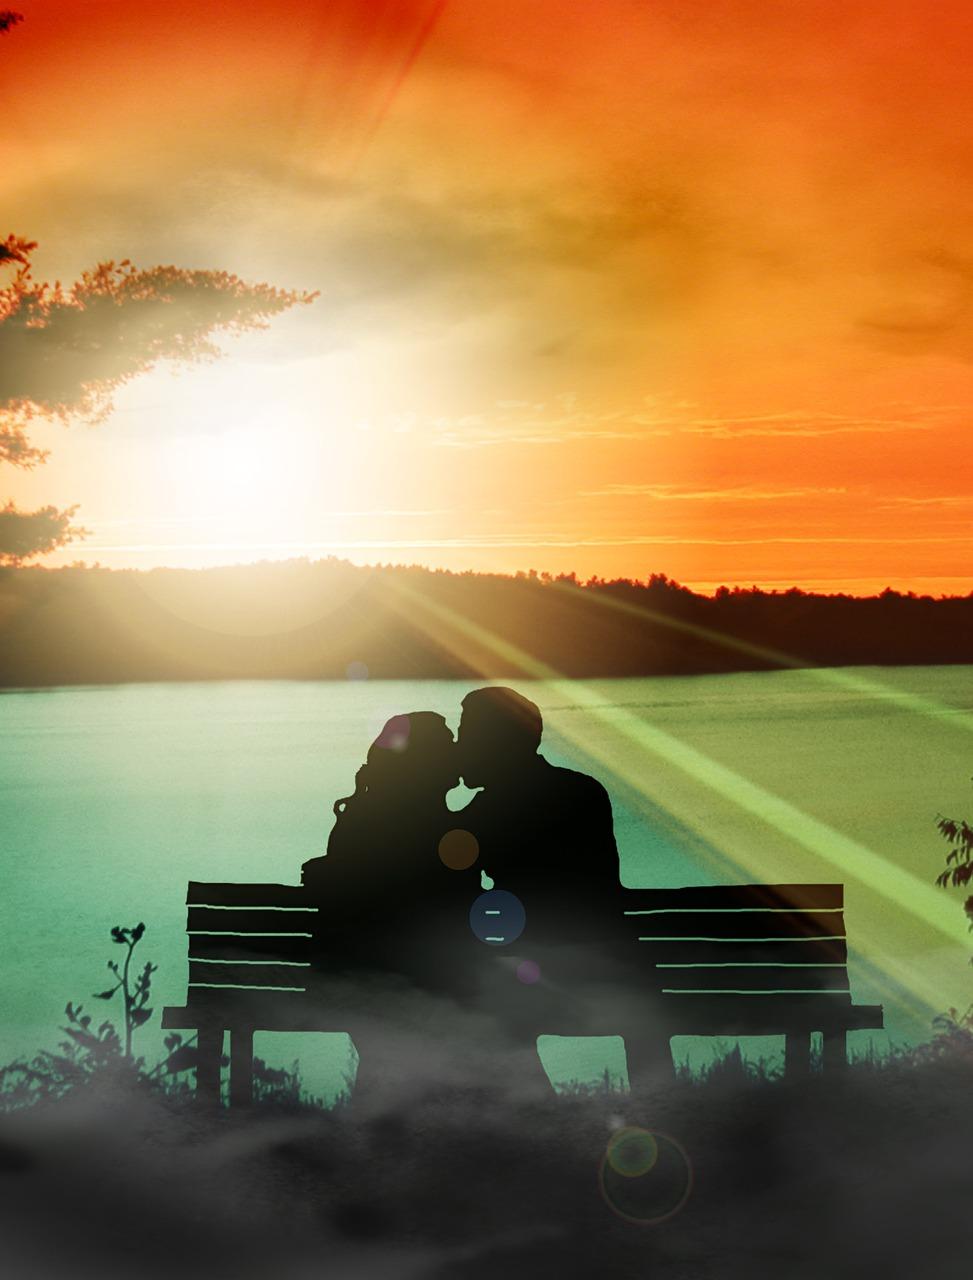 Download Free Photo Of Couple Romantic Romance Love People From Needpix Com